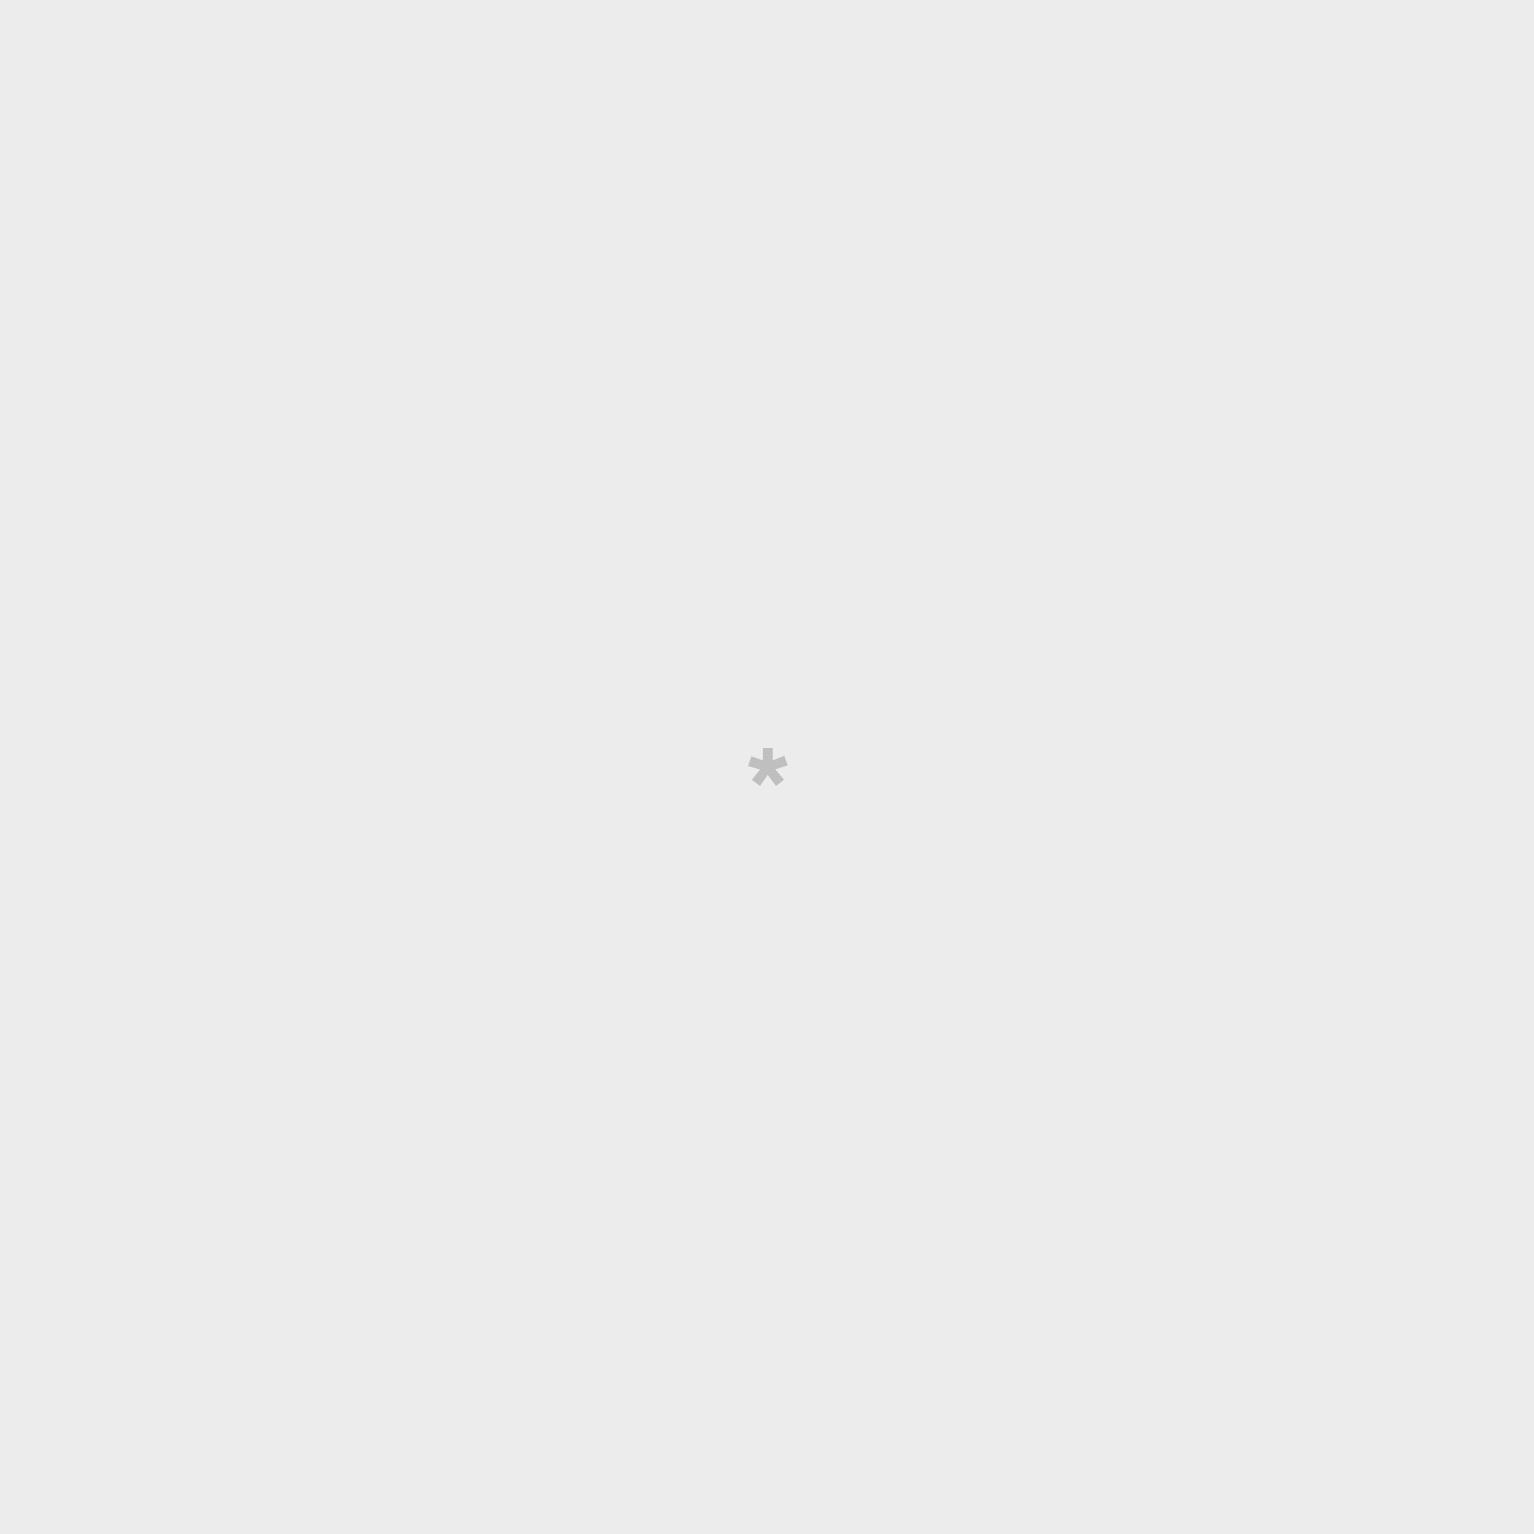 Agenda pequeña clásica 2022 Semanal - ¿Qué aventura te espera hoy?